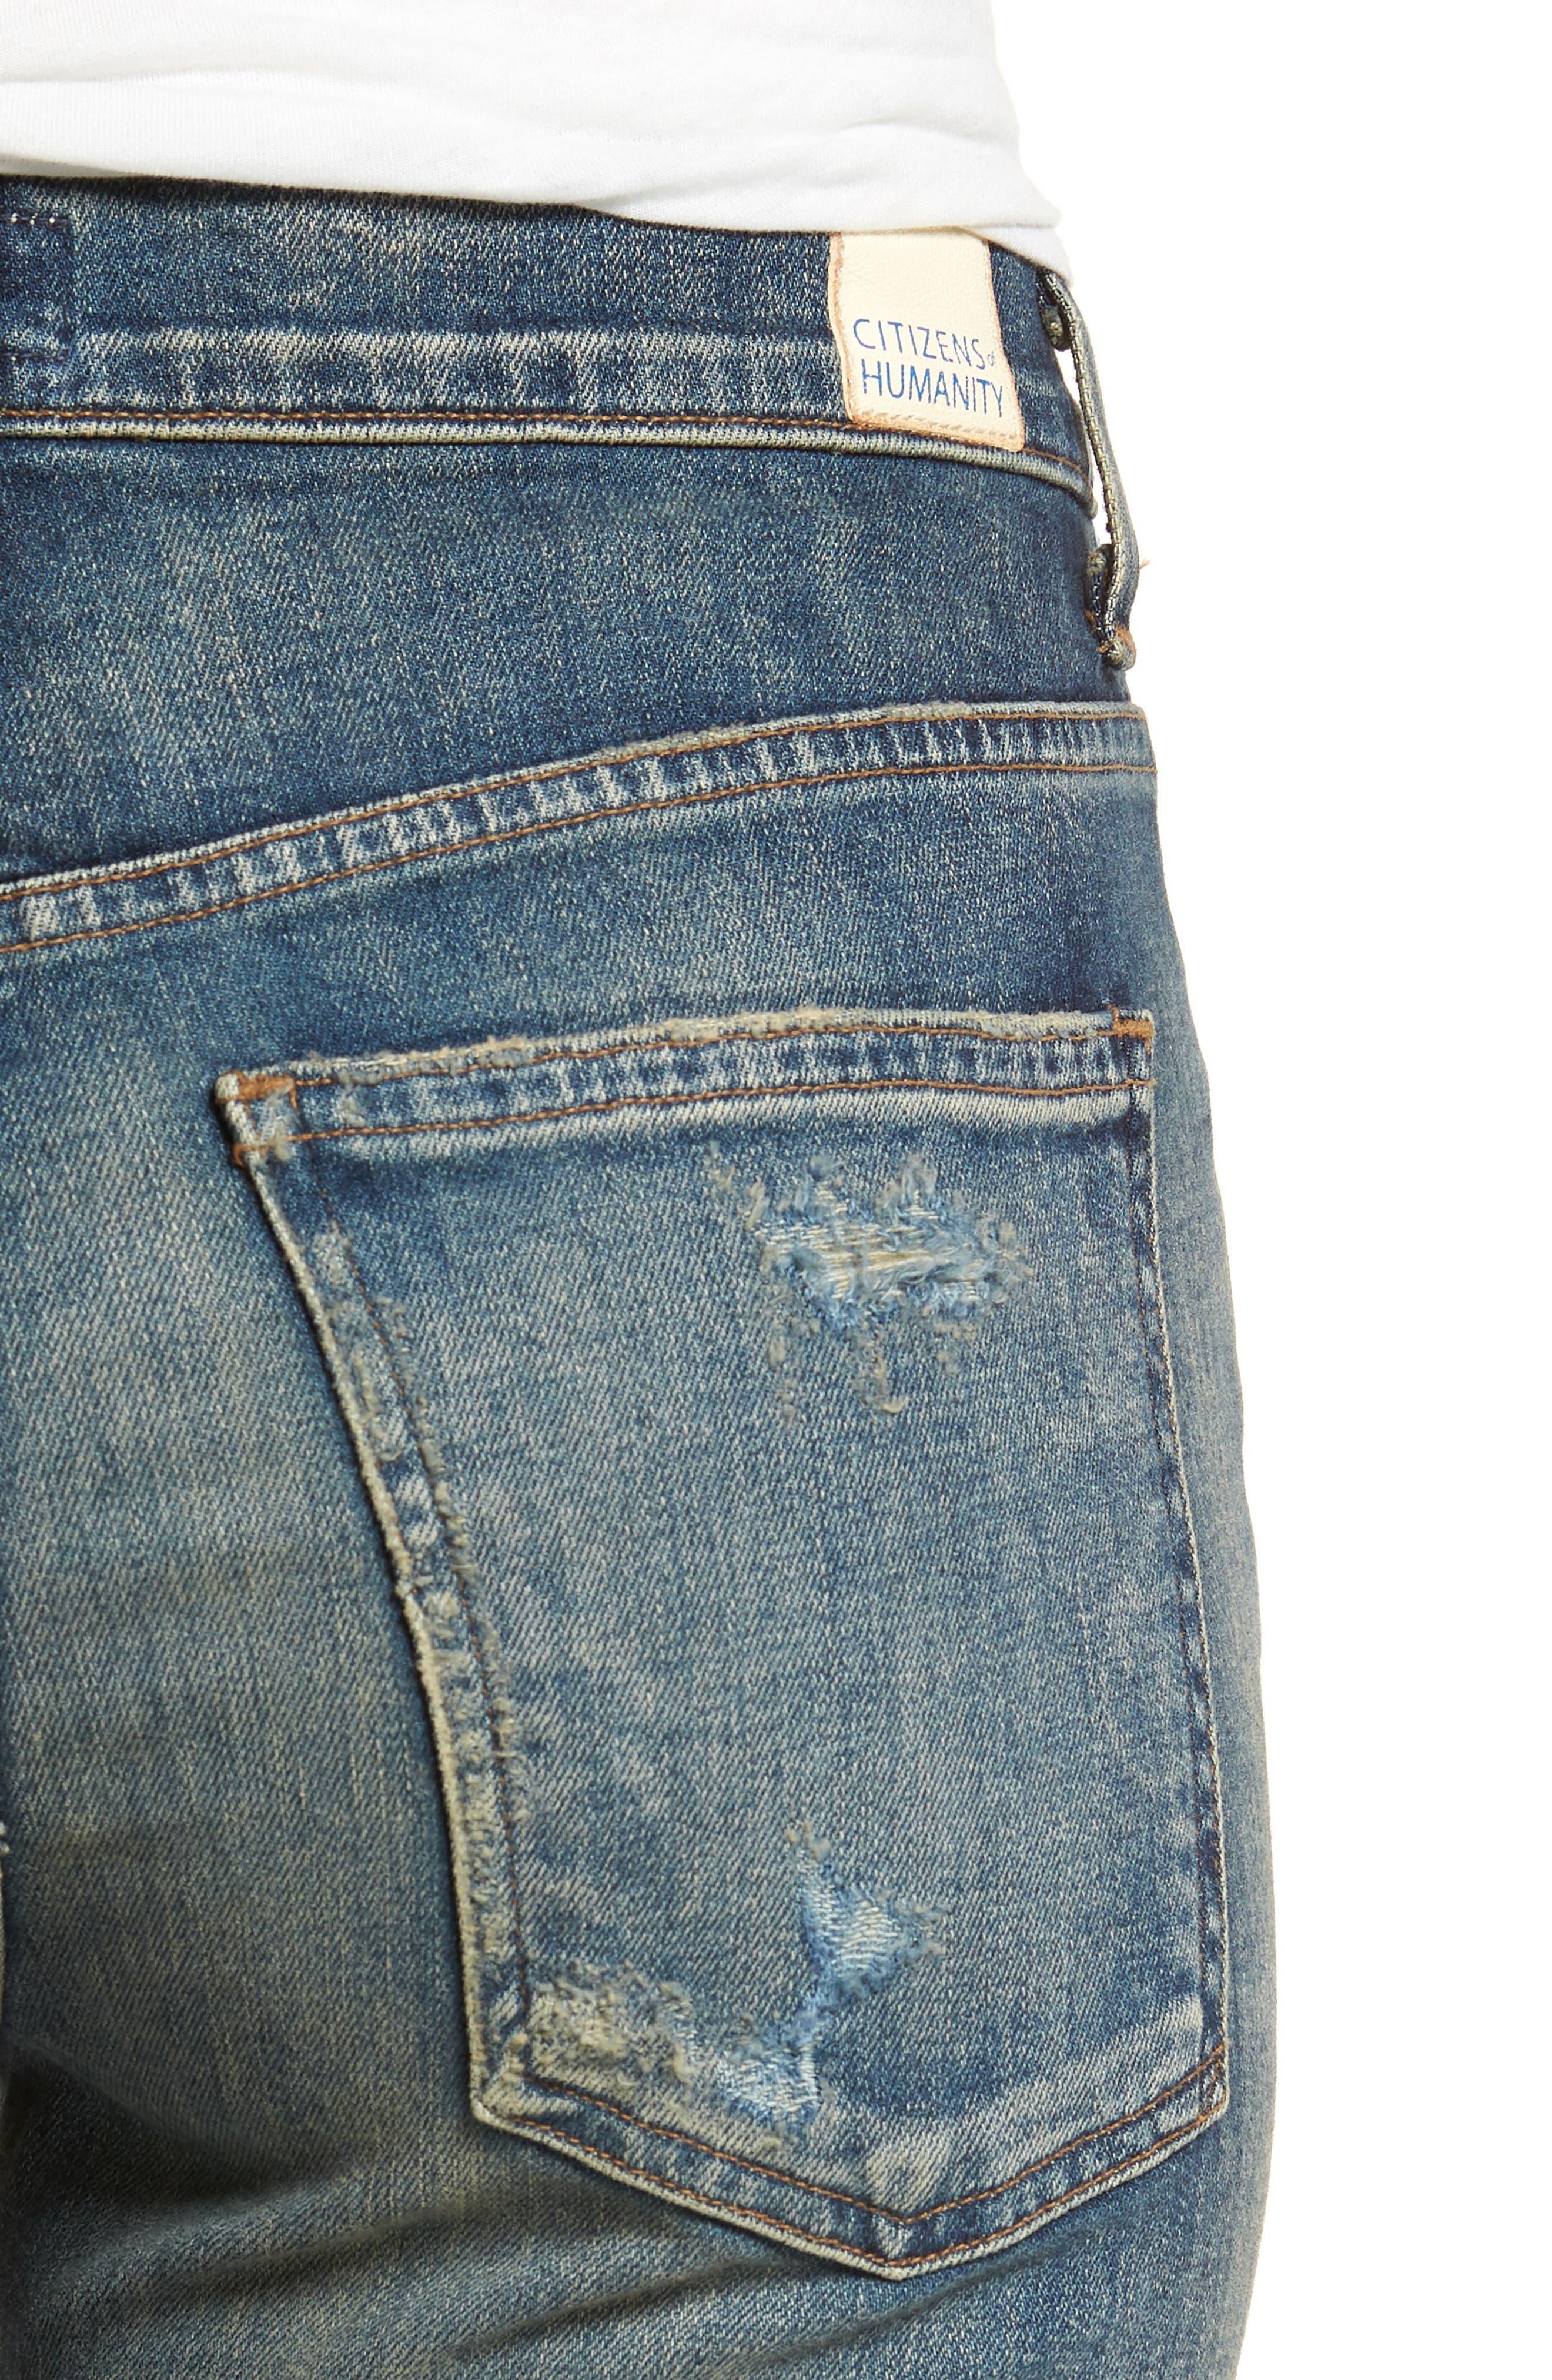 Drew Crop Flare Jeans,                             Alternate thumbnail 4, color,                             422